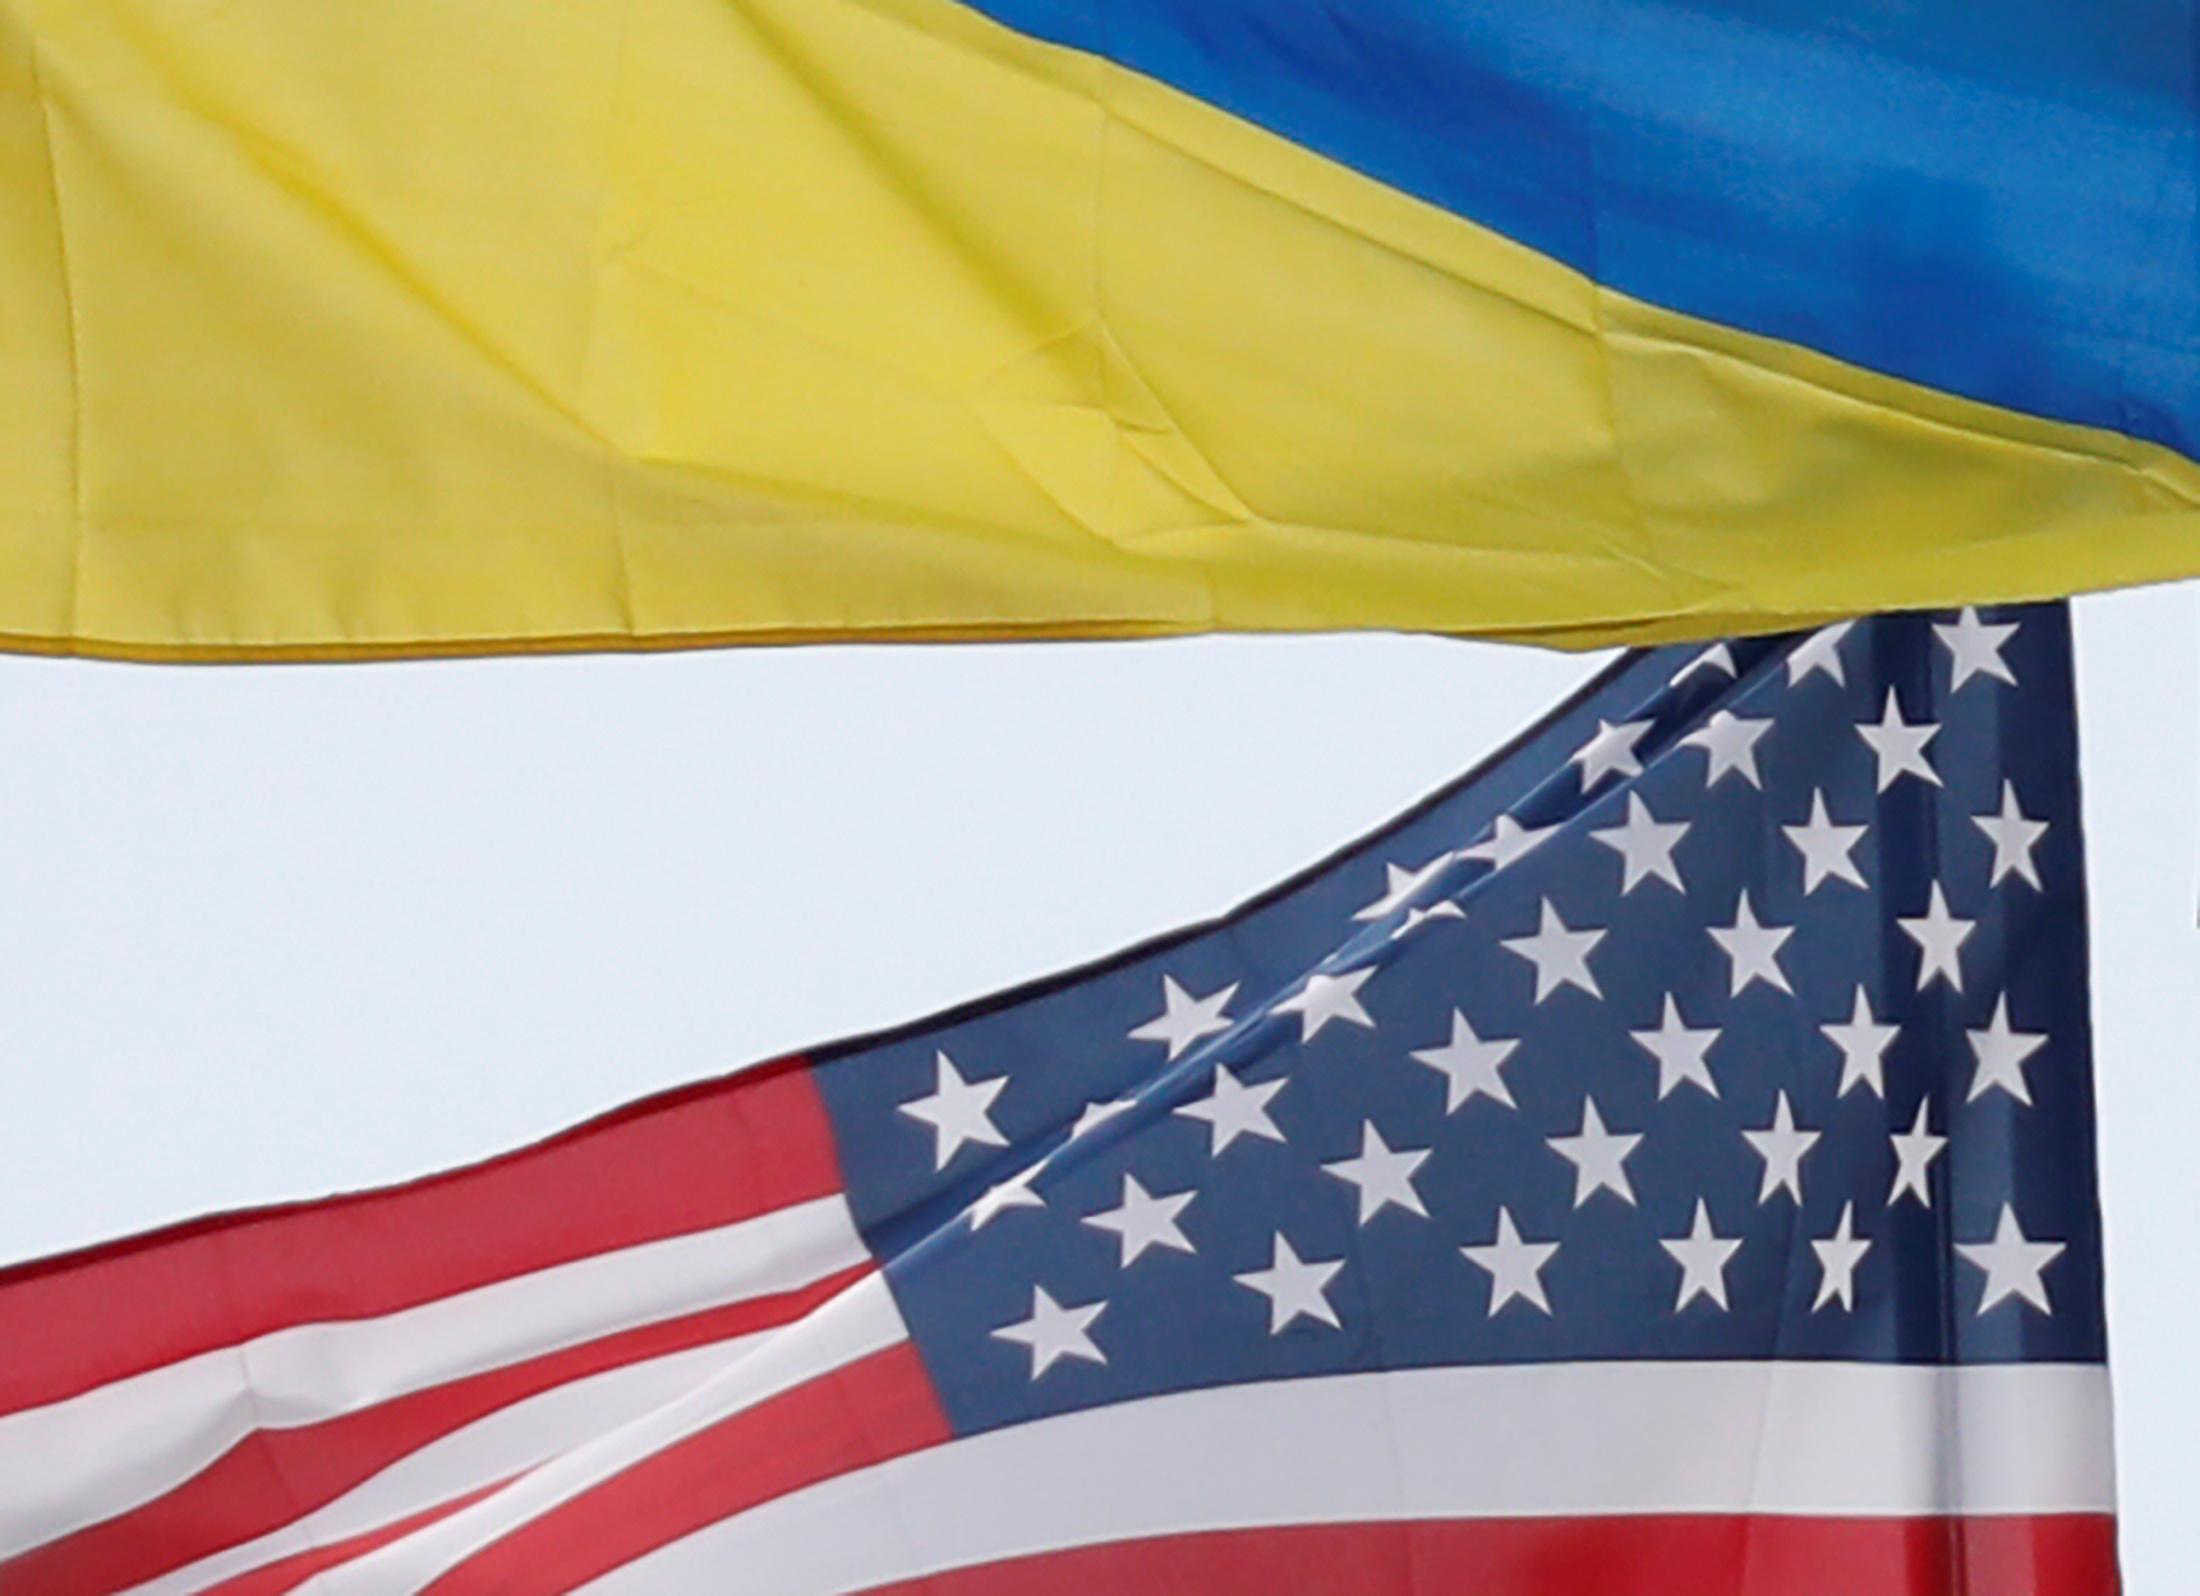 Ukrainian and U.S. state flags fly in central Kiev, Ukraine September 25, 2019. REUTERS/Valentyn Ogirenko